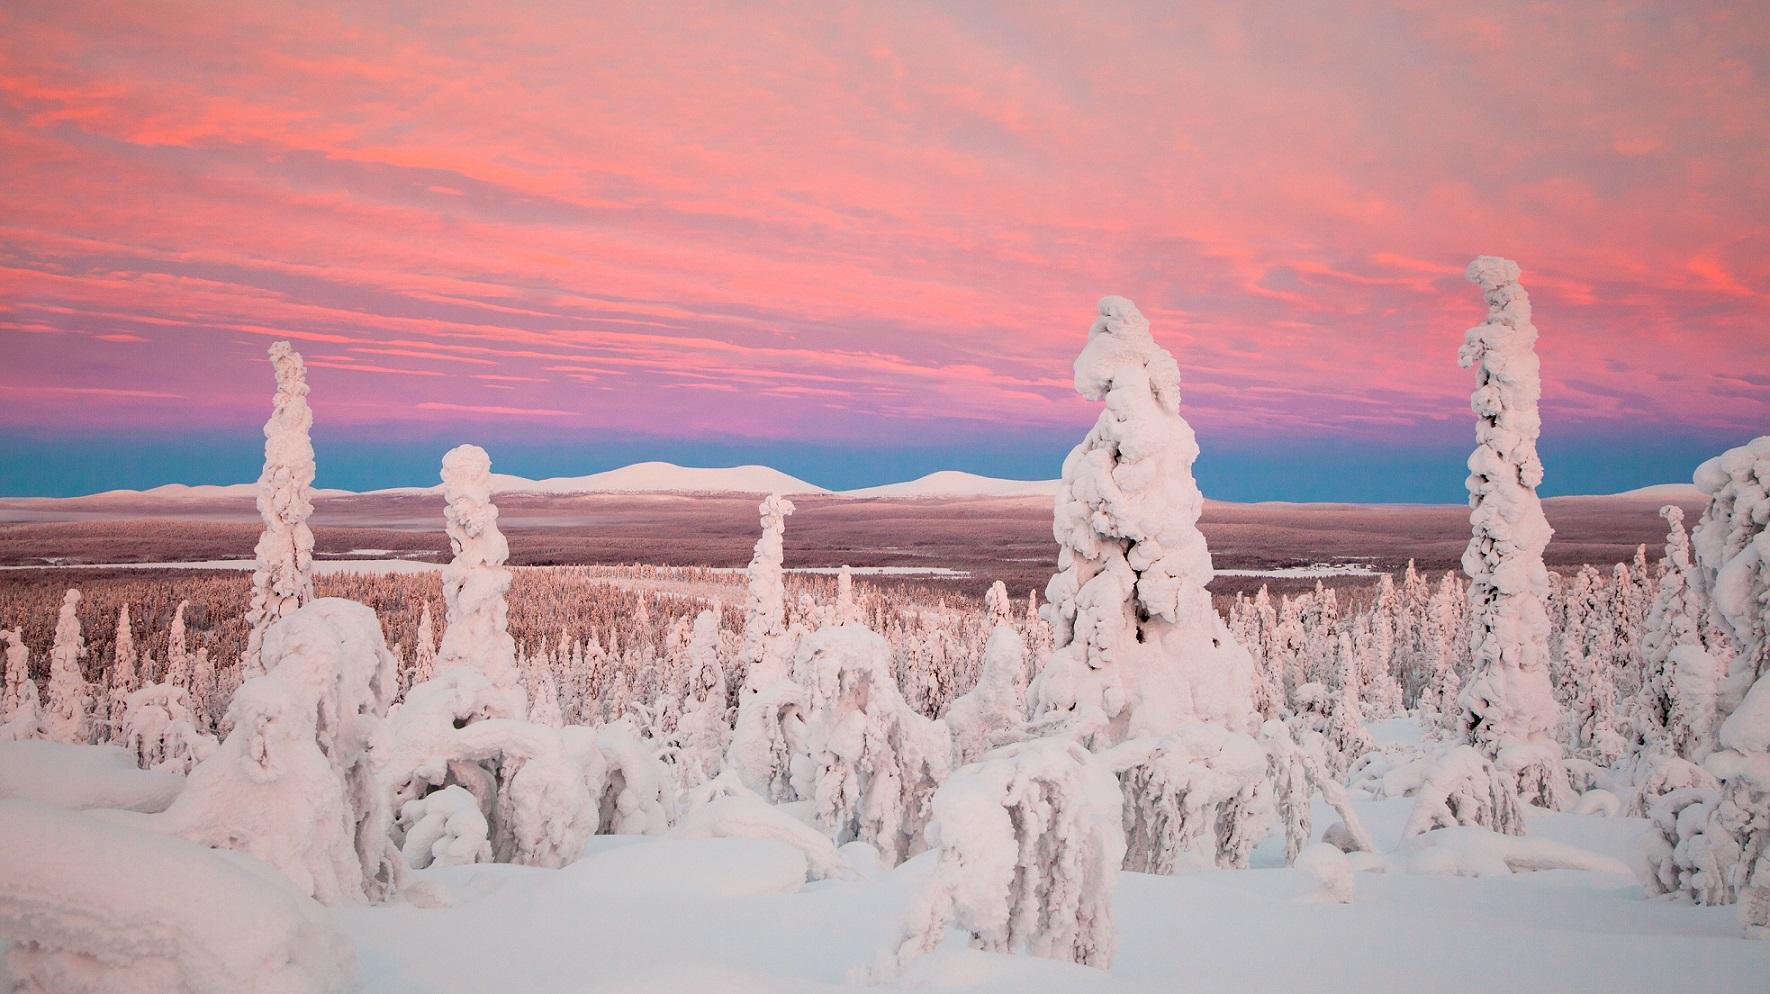 Used Credit Antti Pietikainen 54